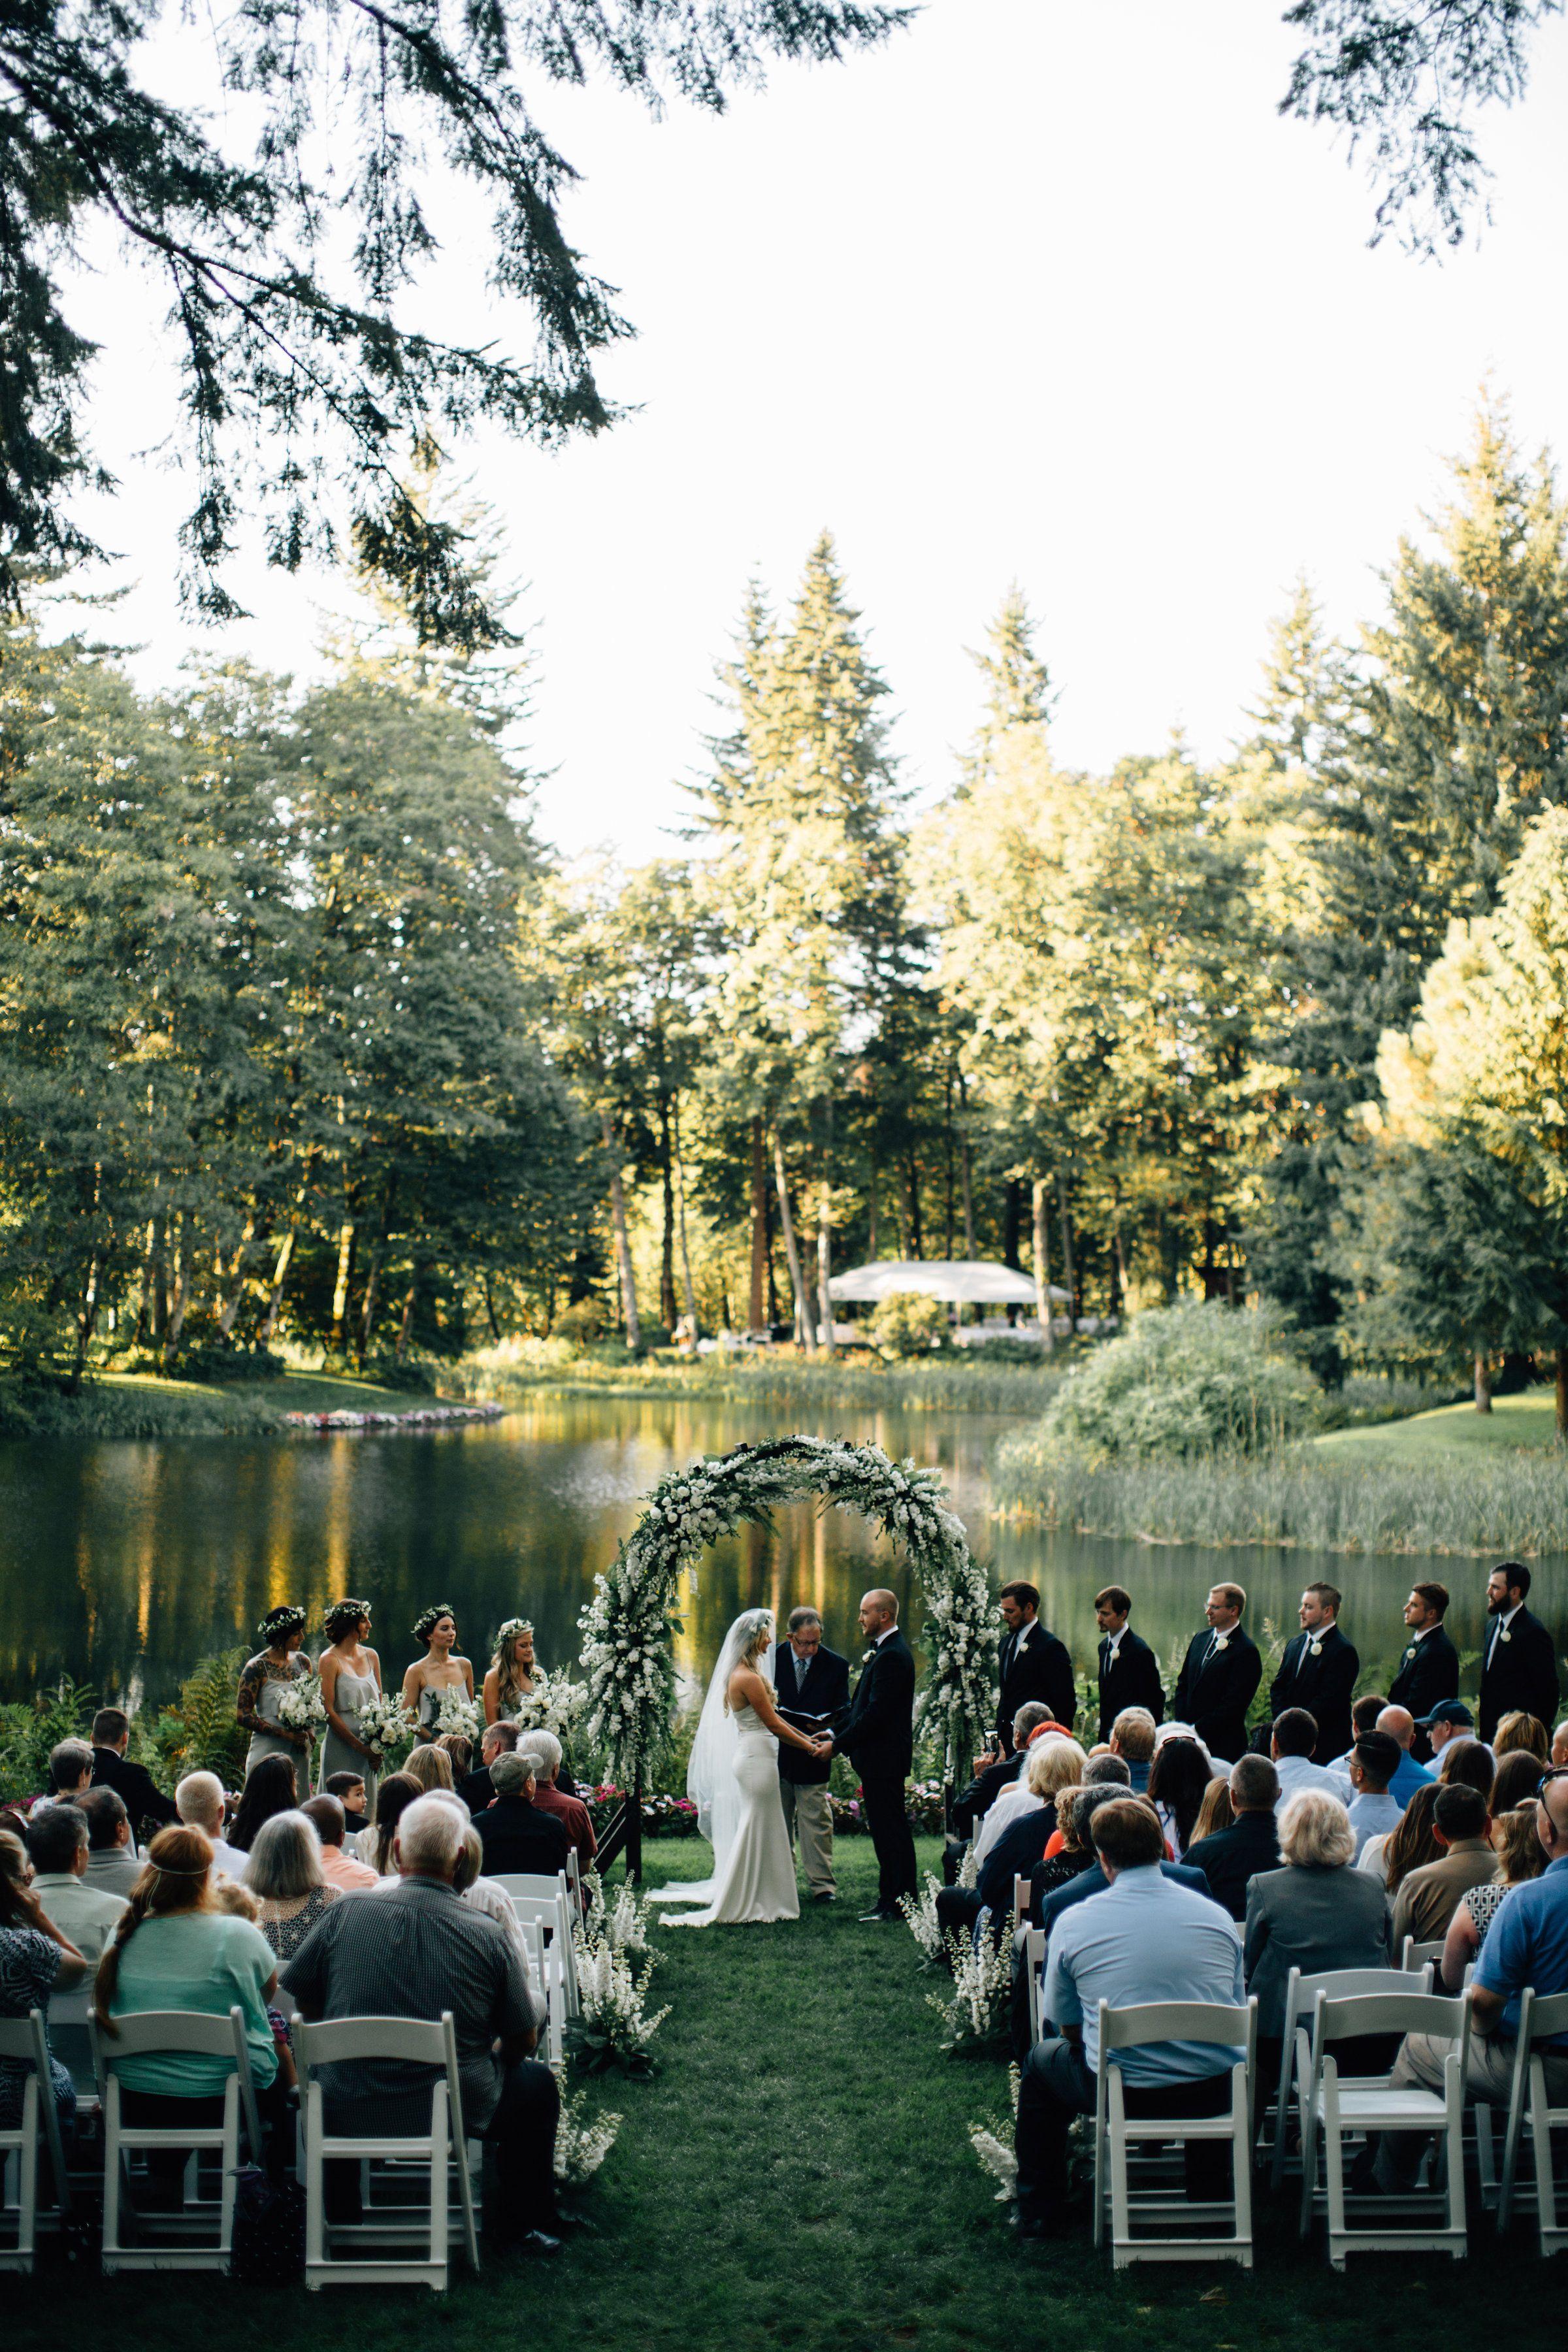 Ultra Romantic Forest Wedding Outdoor Wedding Venues Enchanted Forest Wedding Wedding Venues Oregon